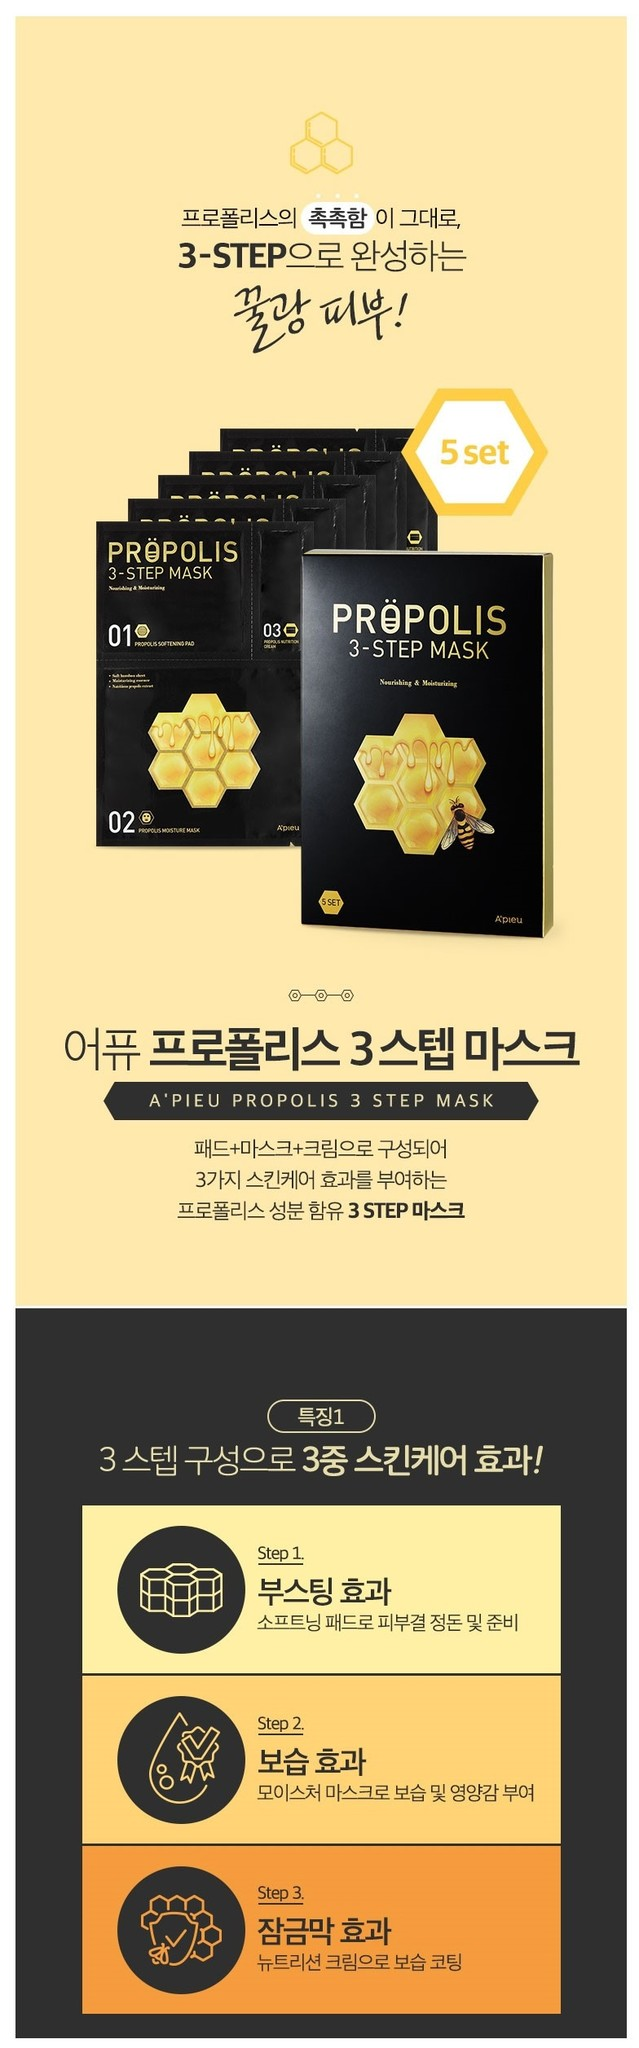 Propolis 3-Step Mask-2